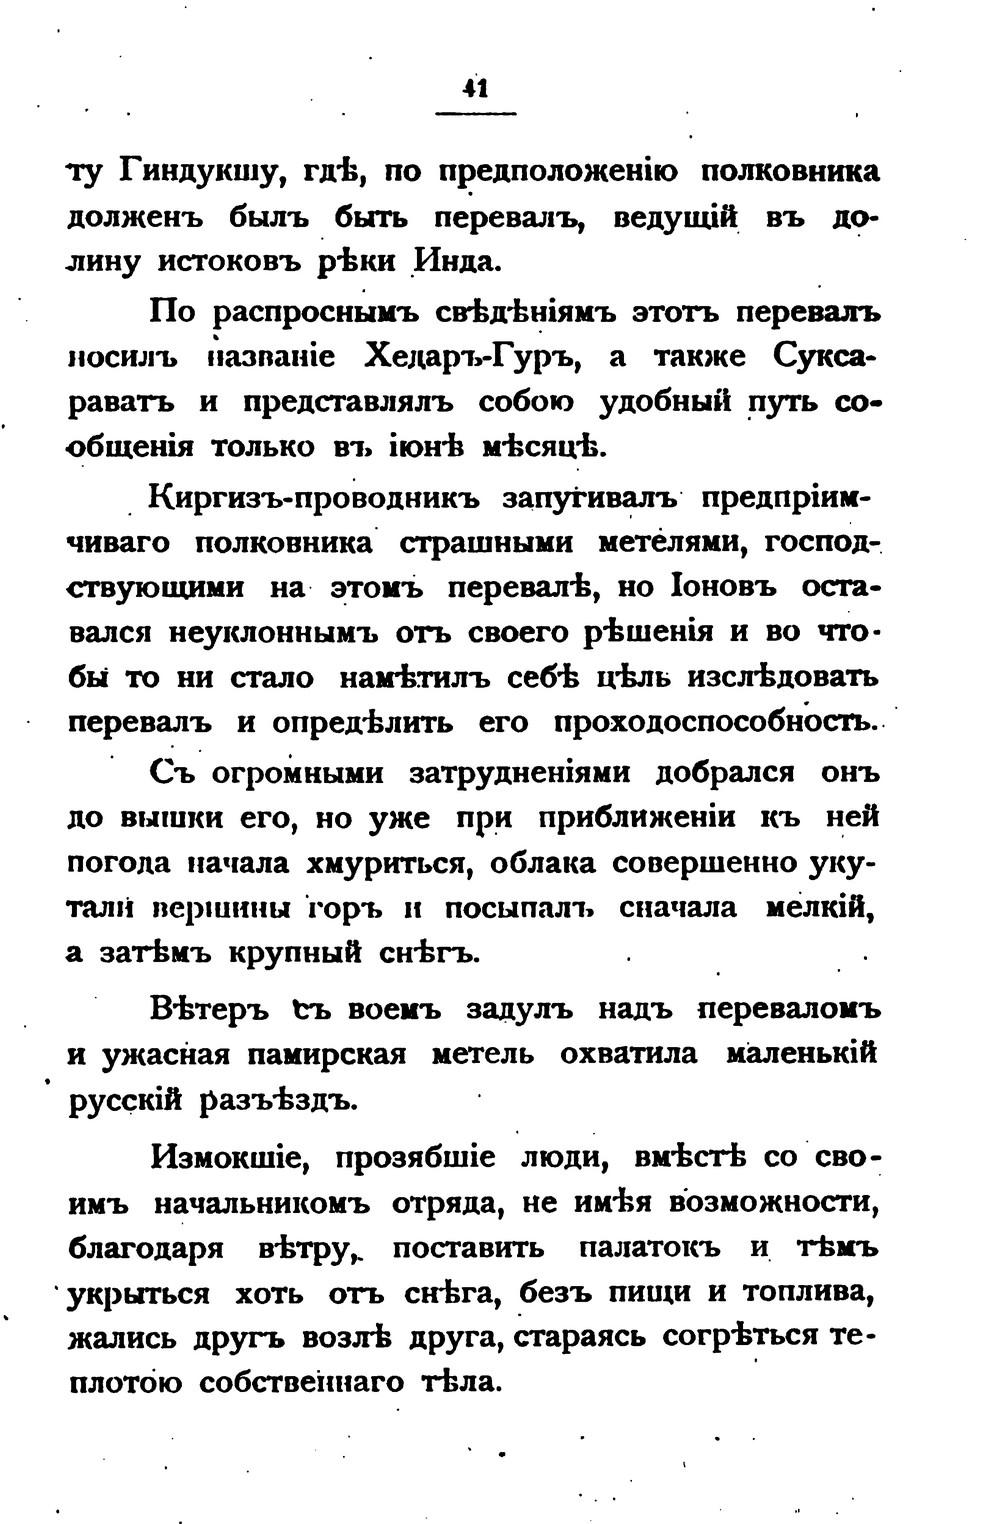 http://i1.imageban.ru/out/2013/11/02/a22deb9ce2e98964de19a63ac8077a82.jpg